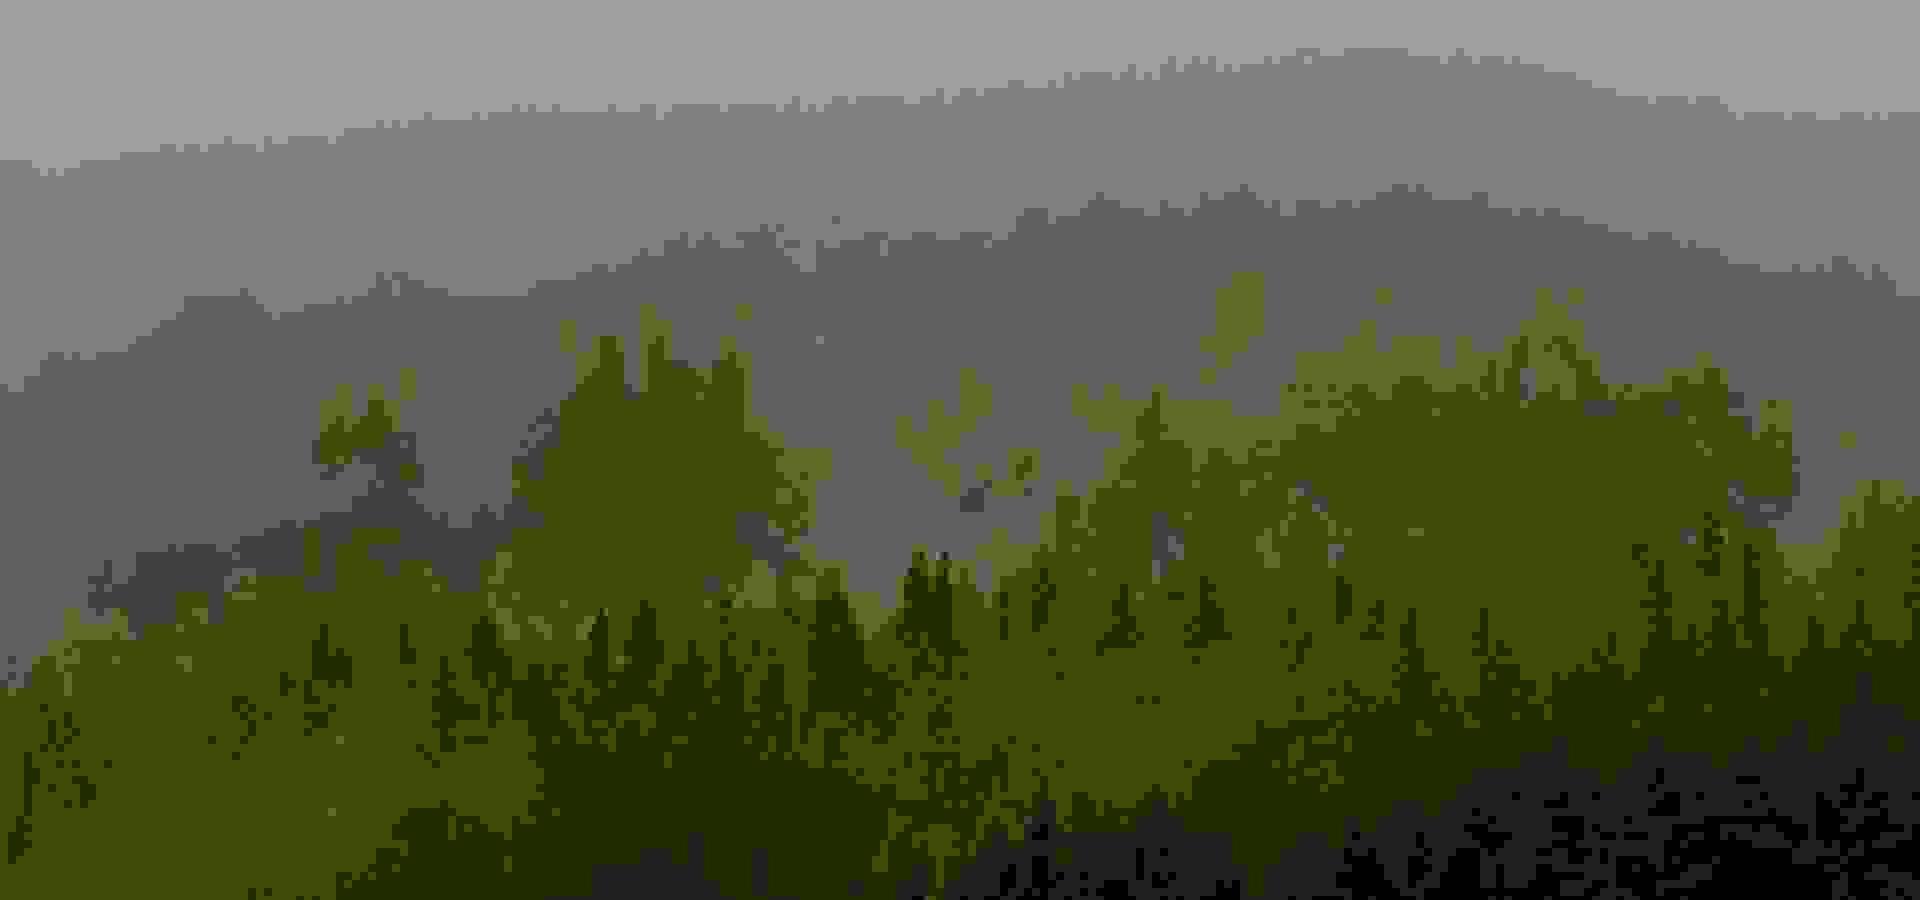 woods, skog, forest, ted logart, 1920 x 1080